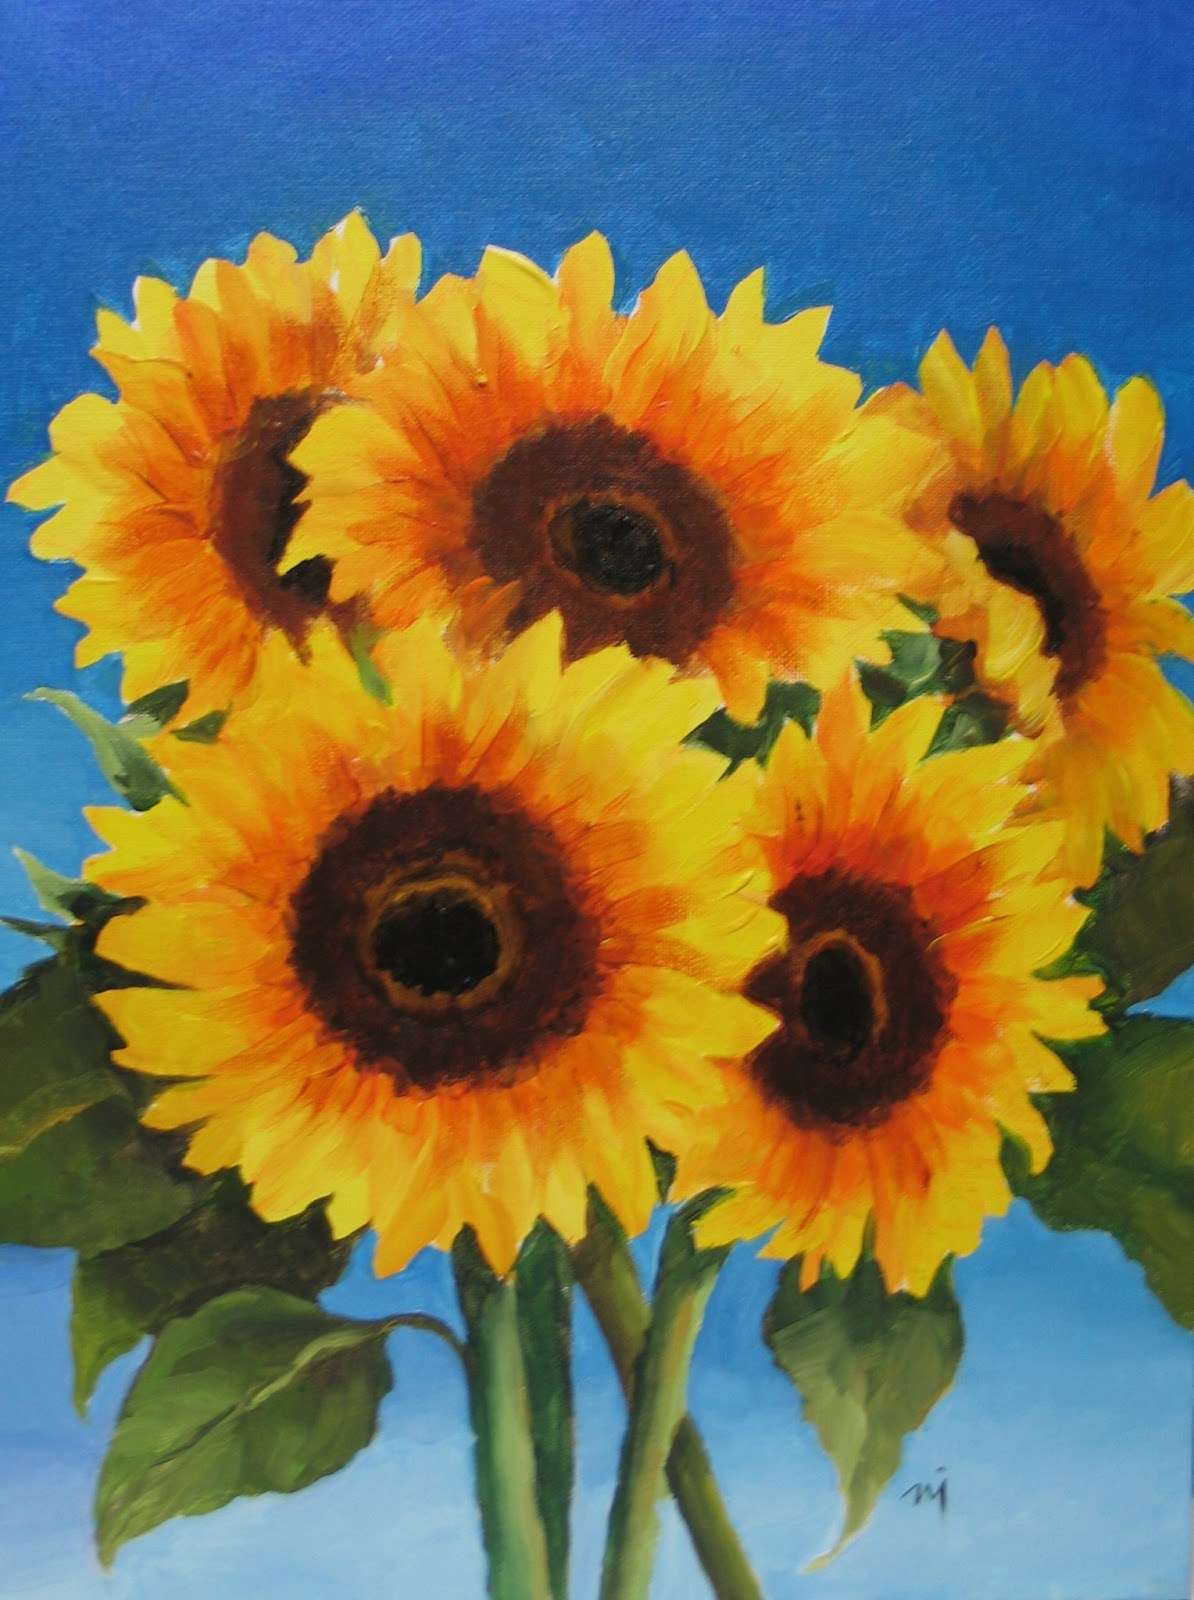 Nel's Everyday Painting: 6/23/13 - 6/30/13